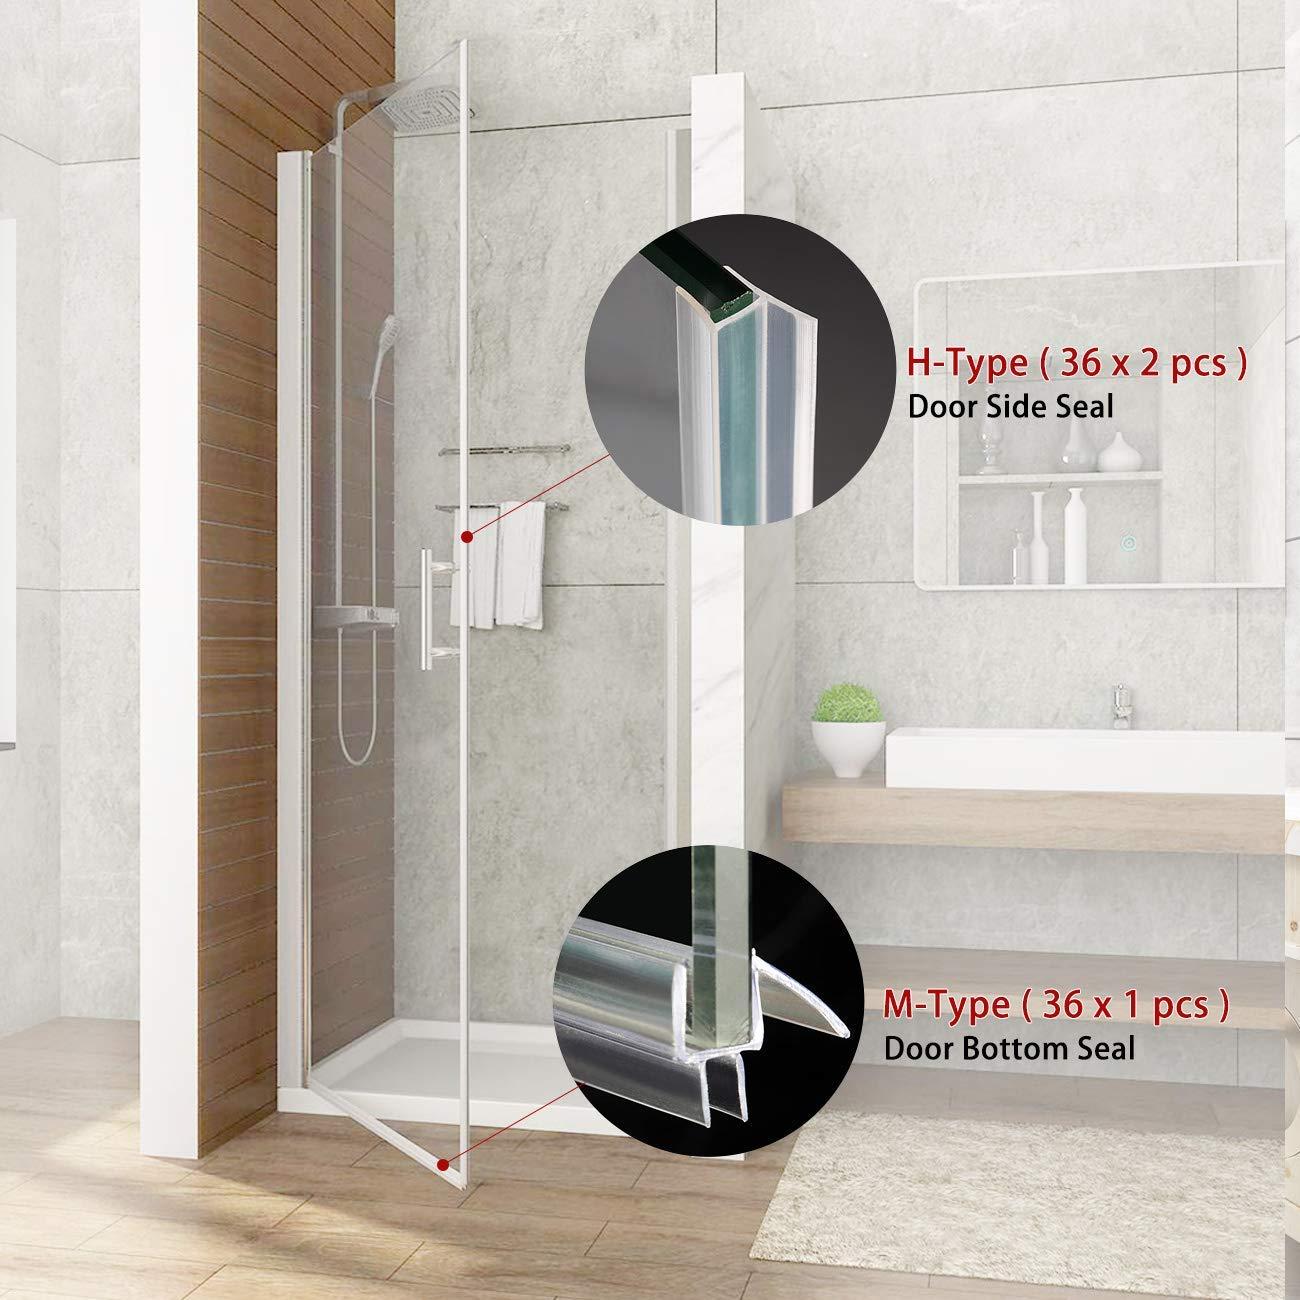 36 Length Frameless Glass Shower Door Seal Strip Glass Door Bottom Strip Set for Door Side and Bottom 1pcs M-Type + 2pcs H-Type MAGZO Glass Shower Door Sweep SET for 1//2 Glass